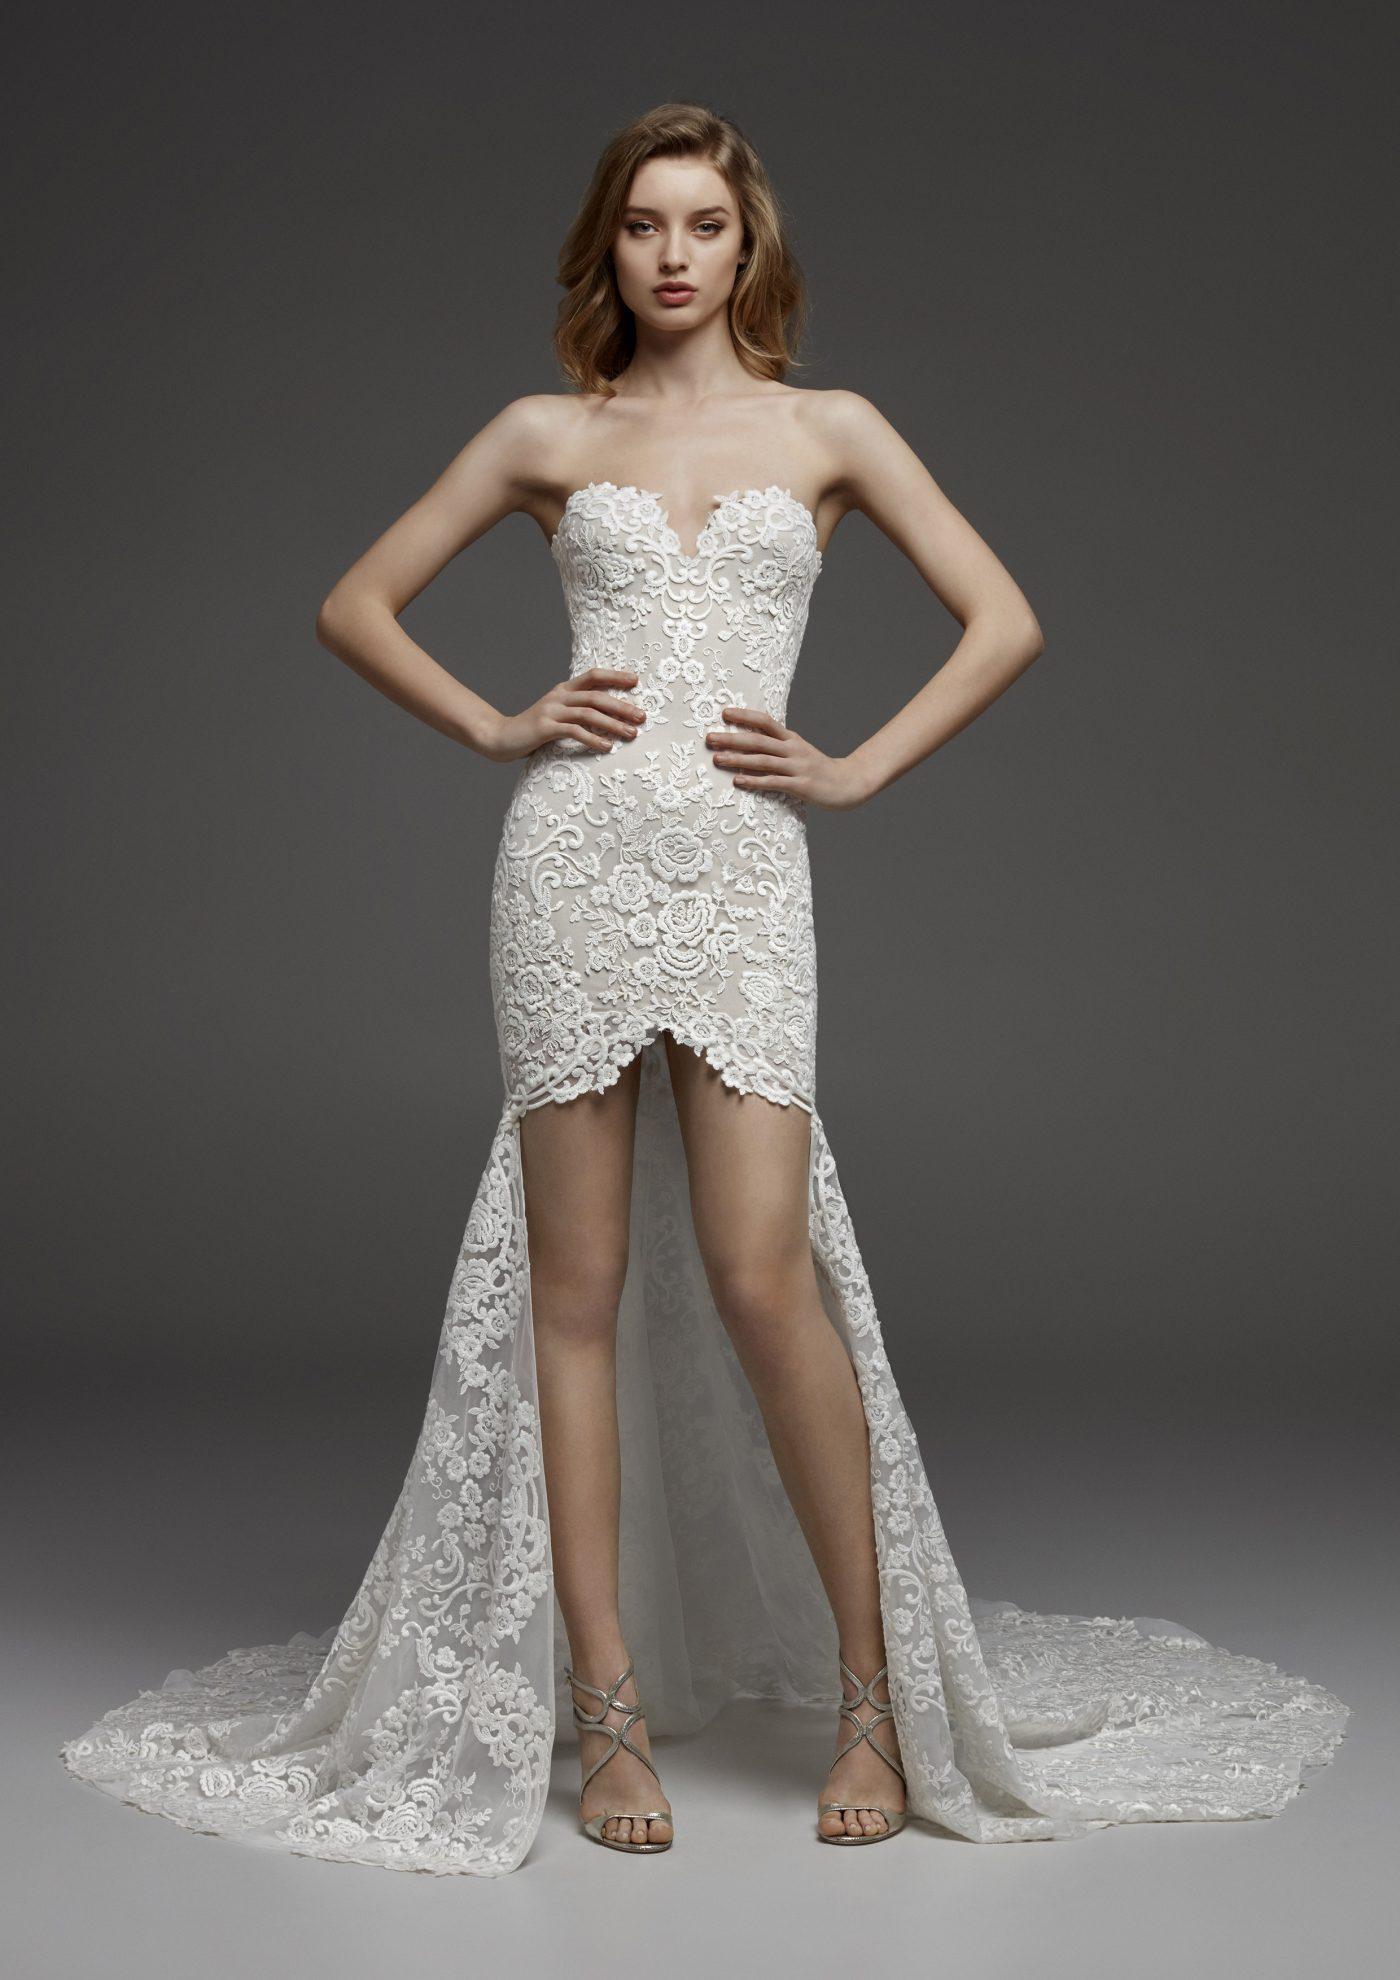 Pronavias wedding dress